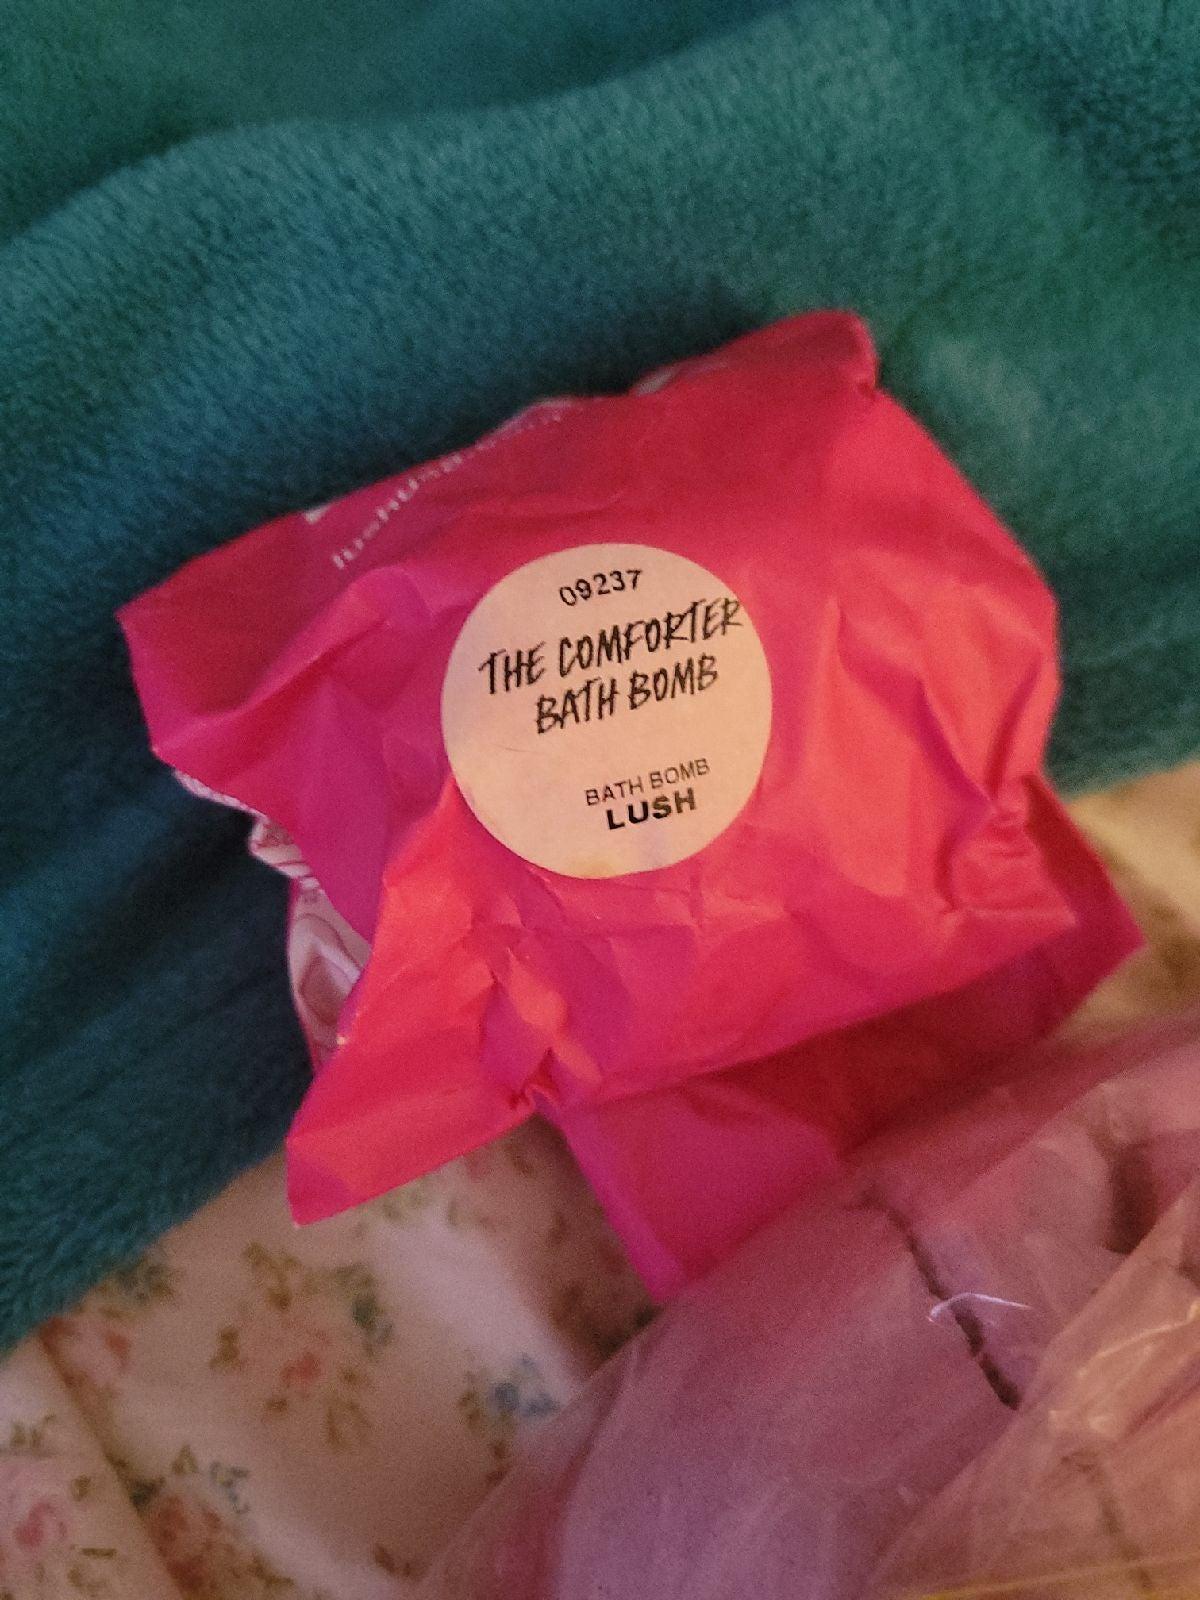 Comforter bath bombs from Lush